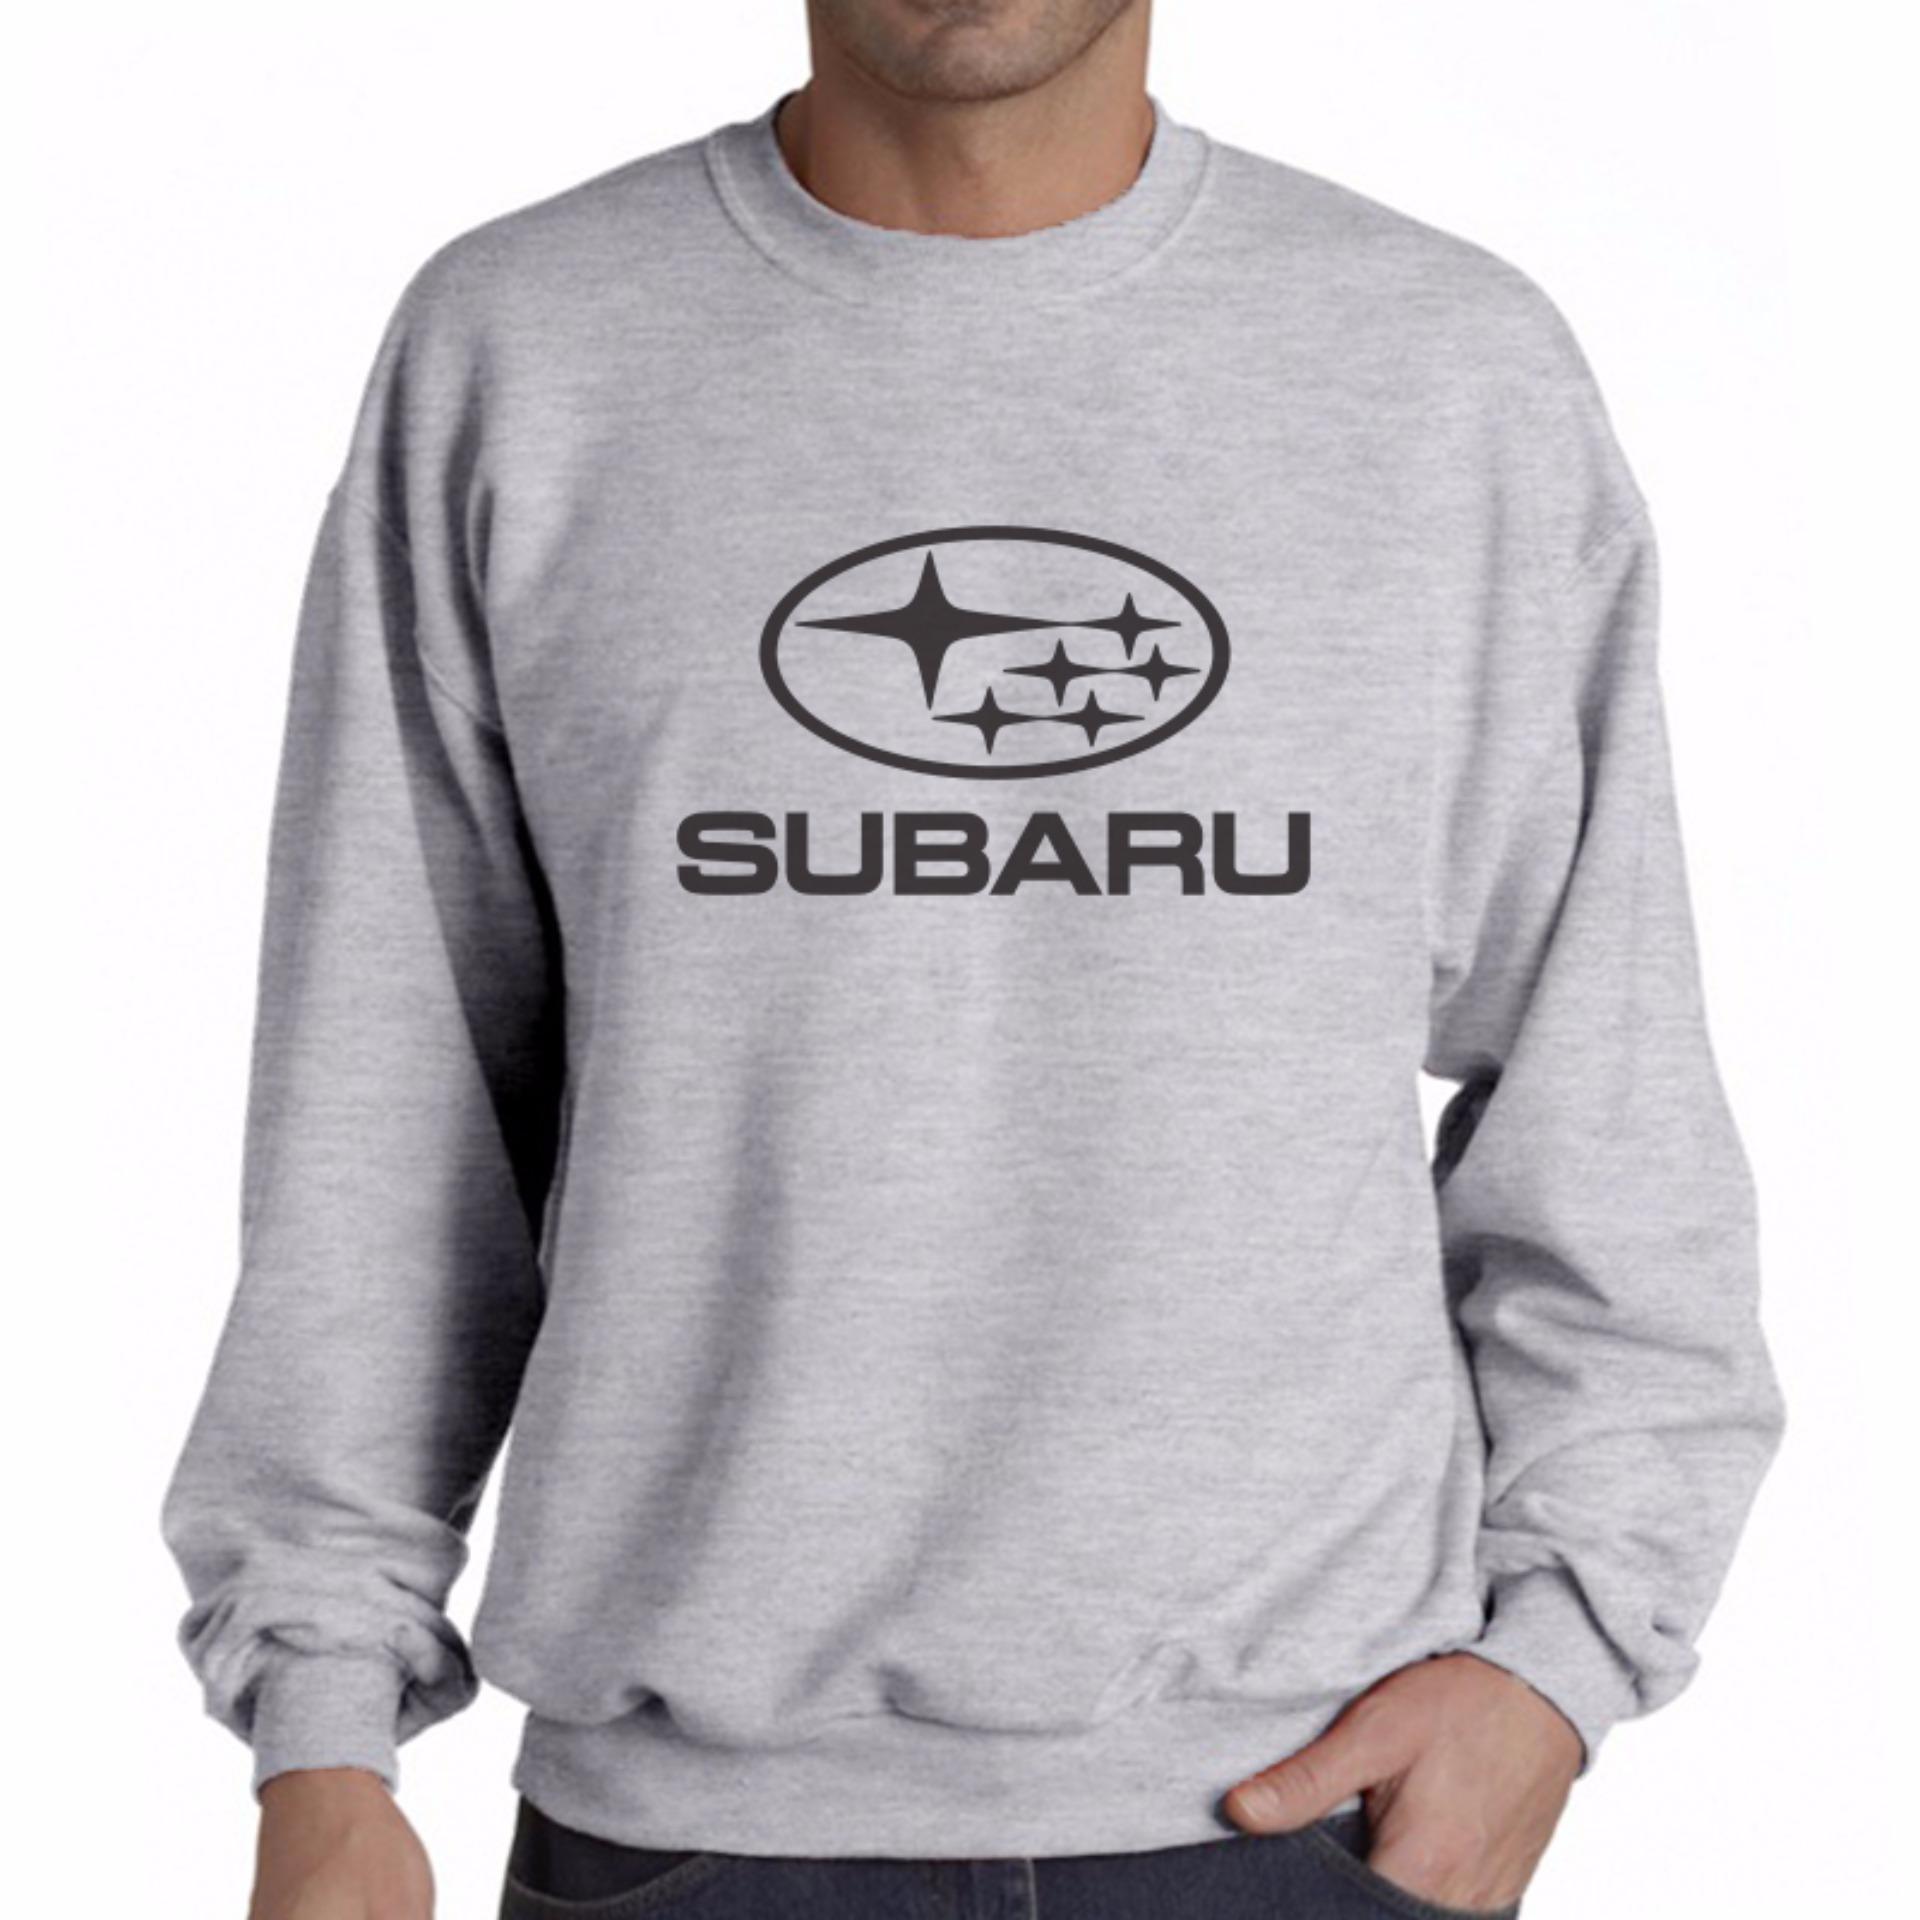 Cross In Mind Sweater Subaru - Abu